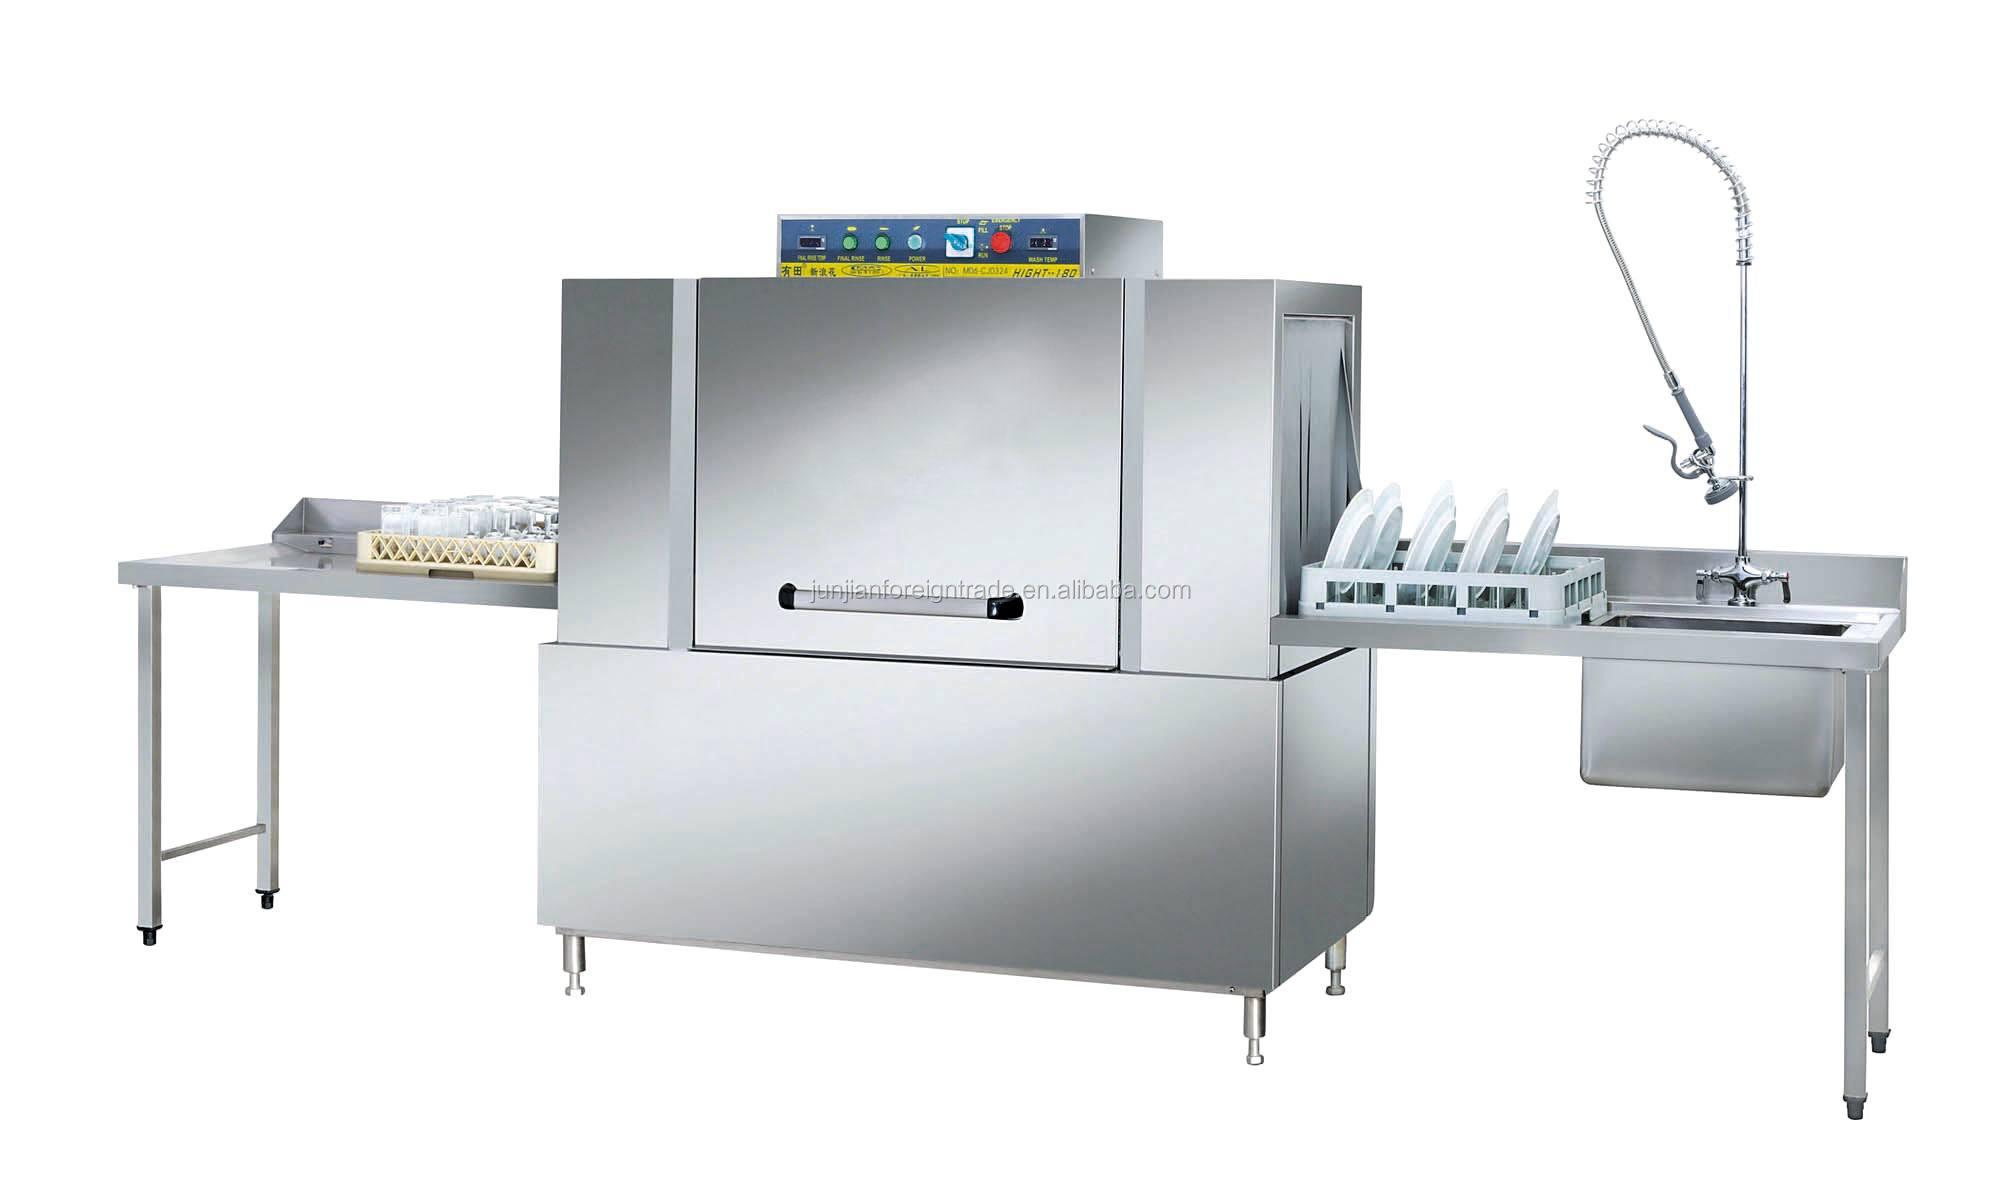 Commercial Dishwasher Restaurant Equipment ~ Restaurant equipment dish washing machine dishwasher made